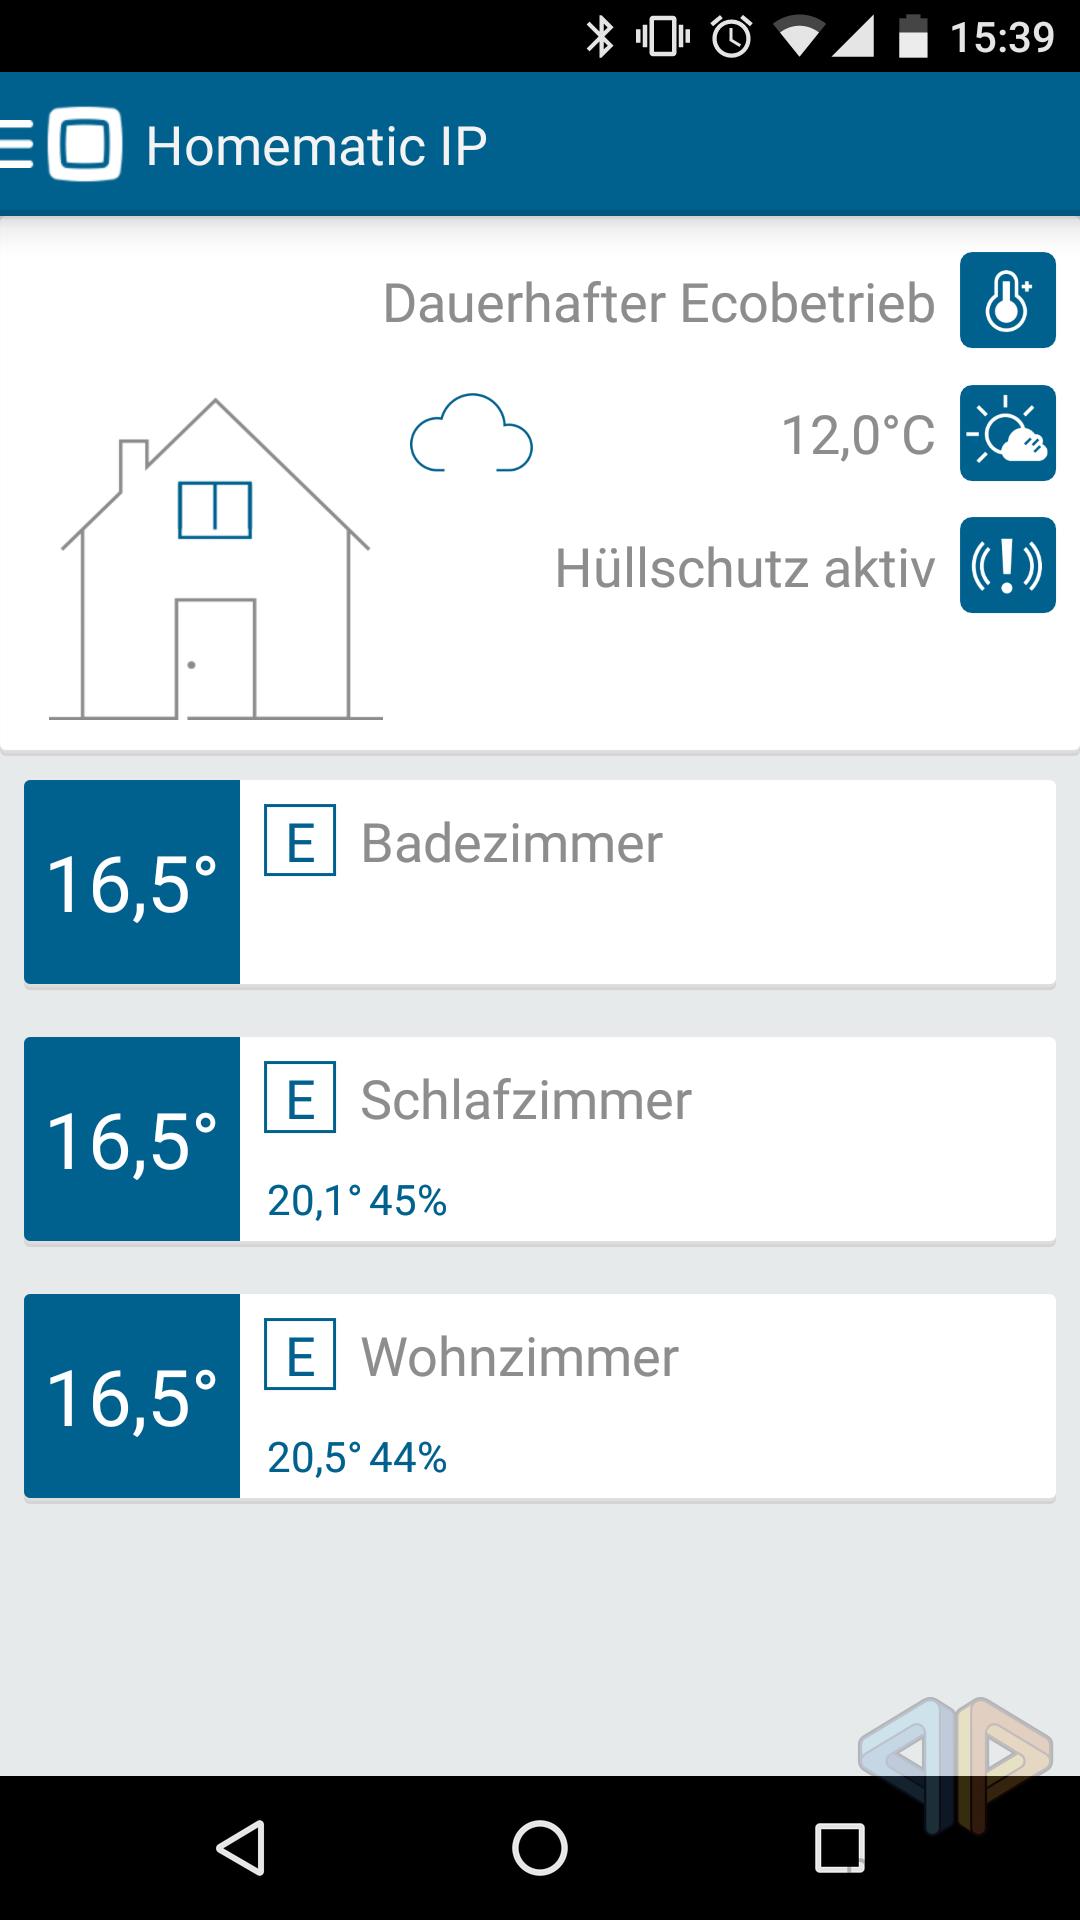 homematic ip heizungssteuerung per smartphone app. Black Bedroom Furniture Sets. Home Design Ideas